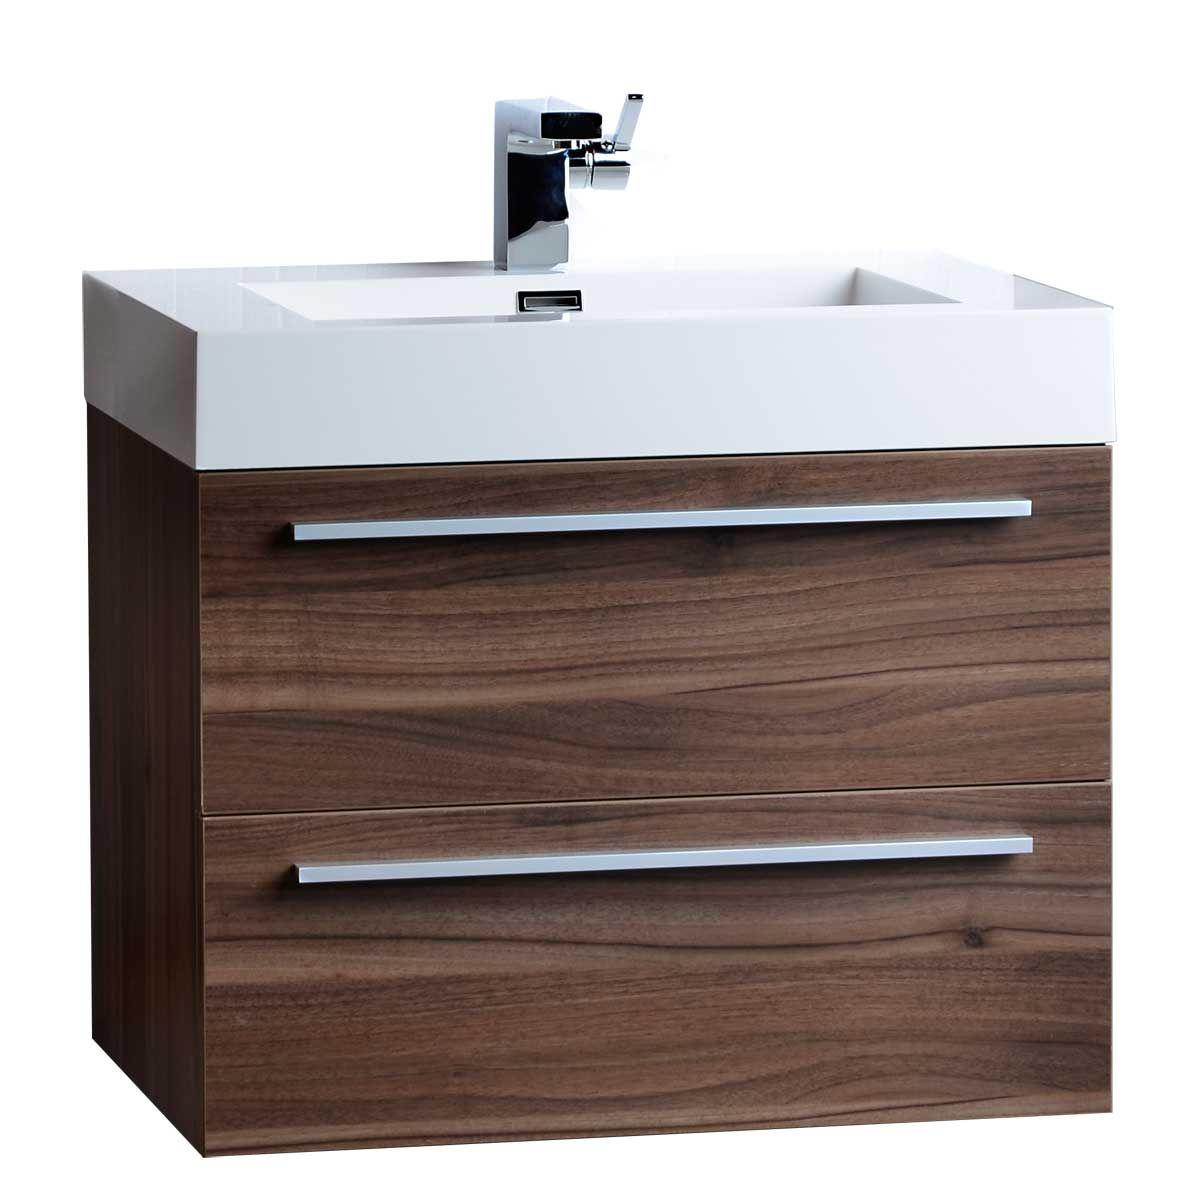 26 75 Single Bathroom Vanity Set In Walnut Tn T690 Wn